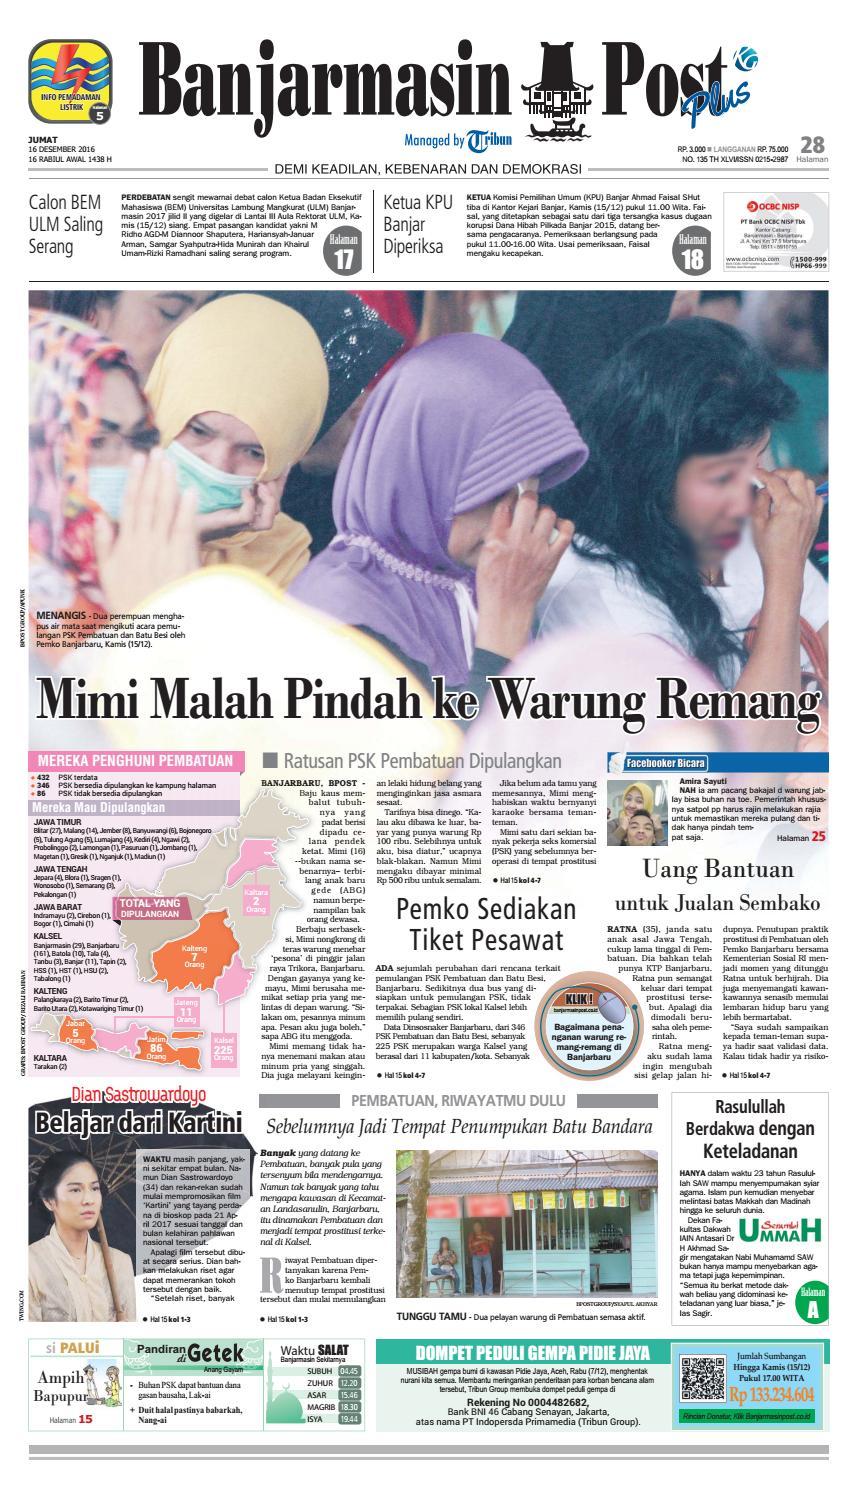 Bp20161216 By Banjarmasin Post Issuu Kue Ulat Sutra Febby Cookies Pal